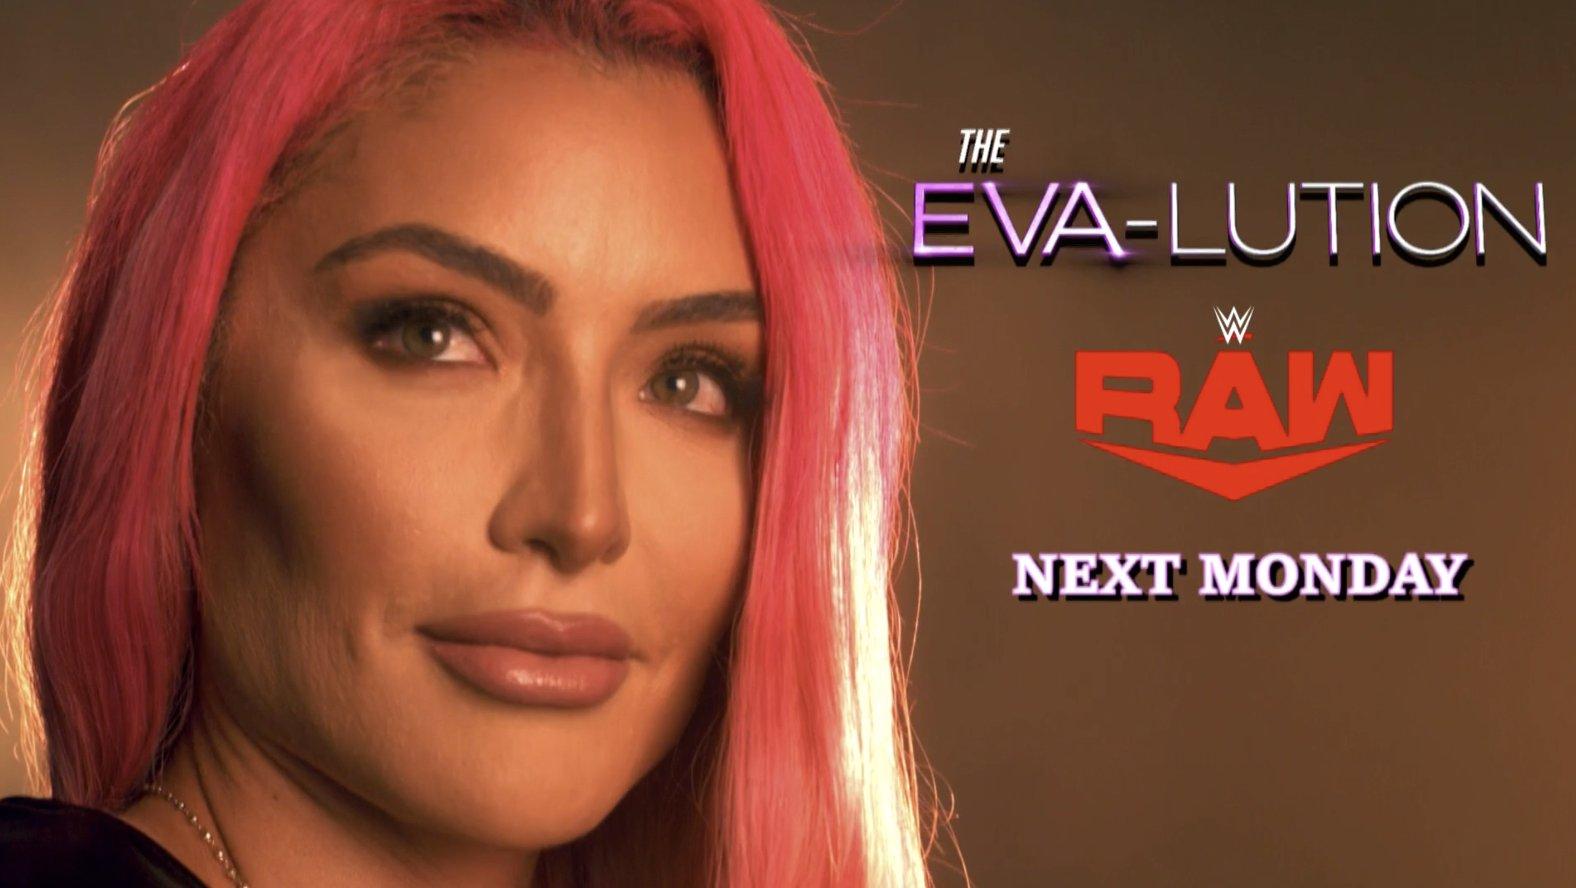 WWE Raw Preview (14/06/21): Styles Vs. McIntyre; RK-Bro Vs. New Day; Eva Marie Returns 1